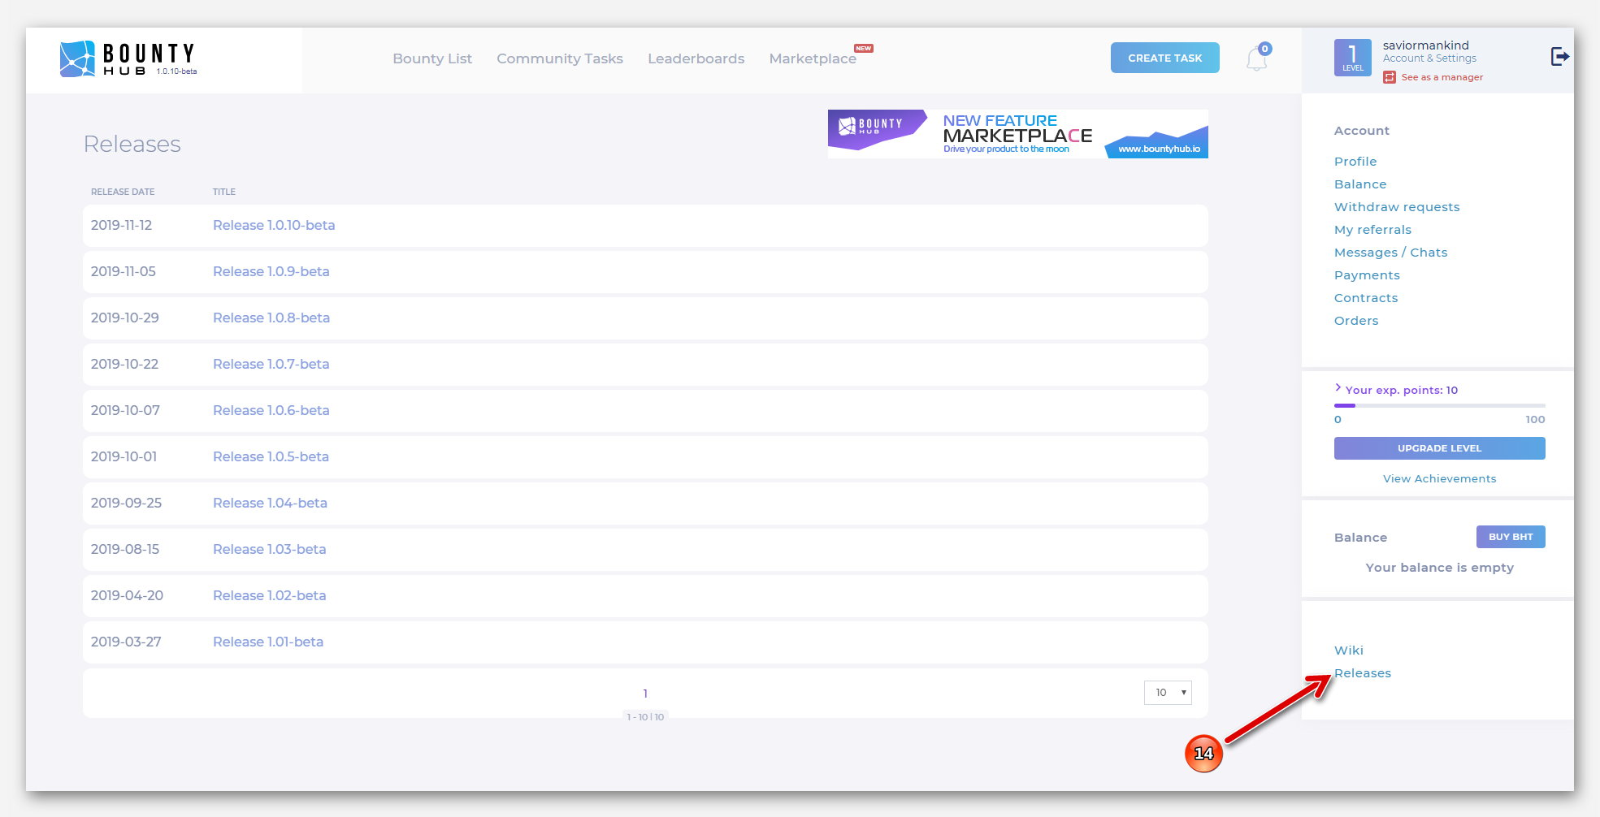 Список обновлений, на платформе BountyHub